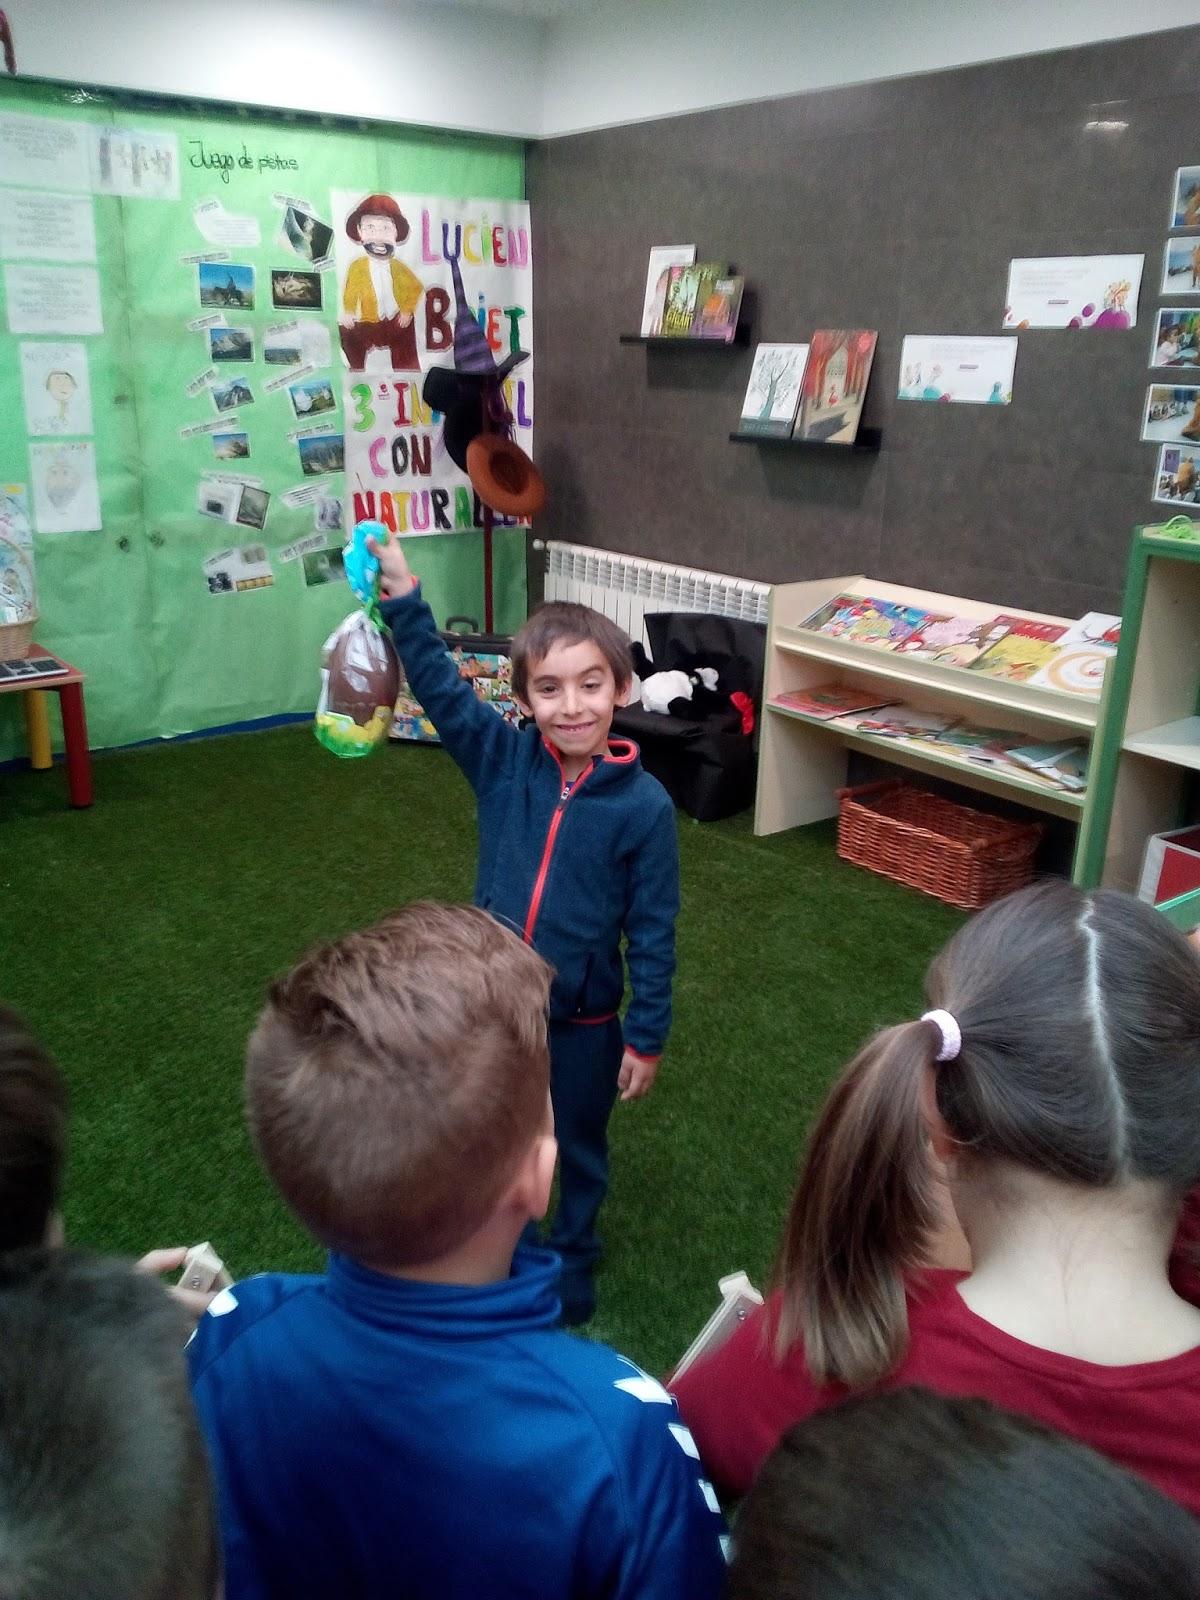 Excepcional Montessori Maestra Preescolar Reanudar Muestras Friso ...